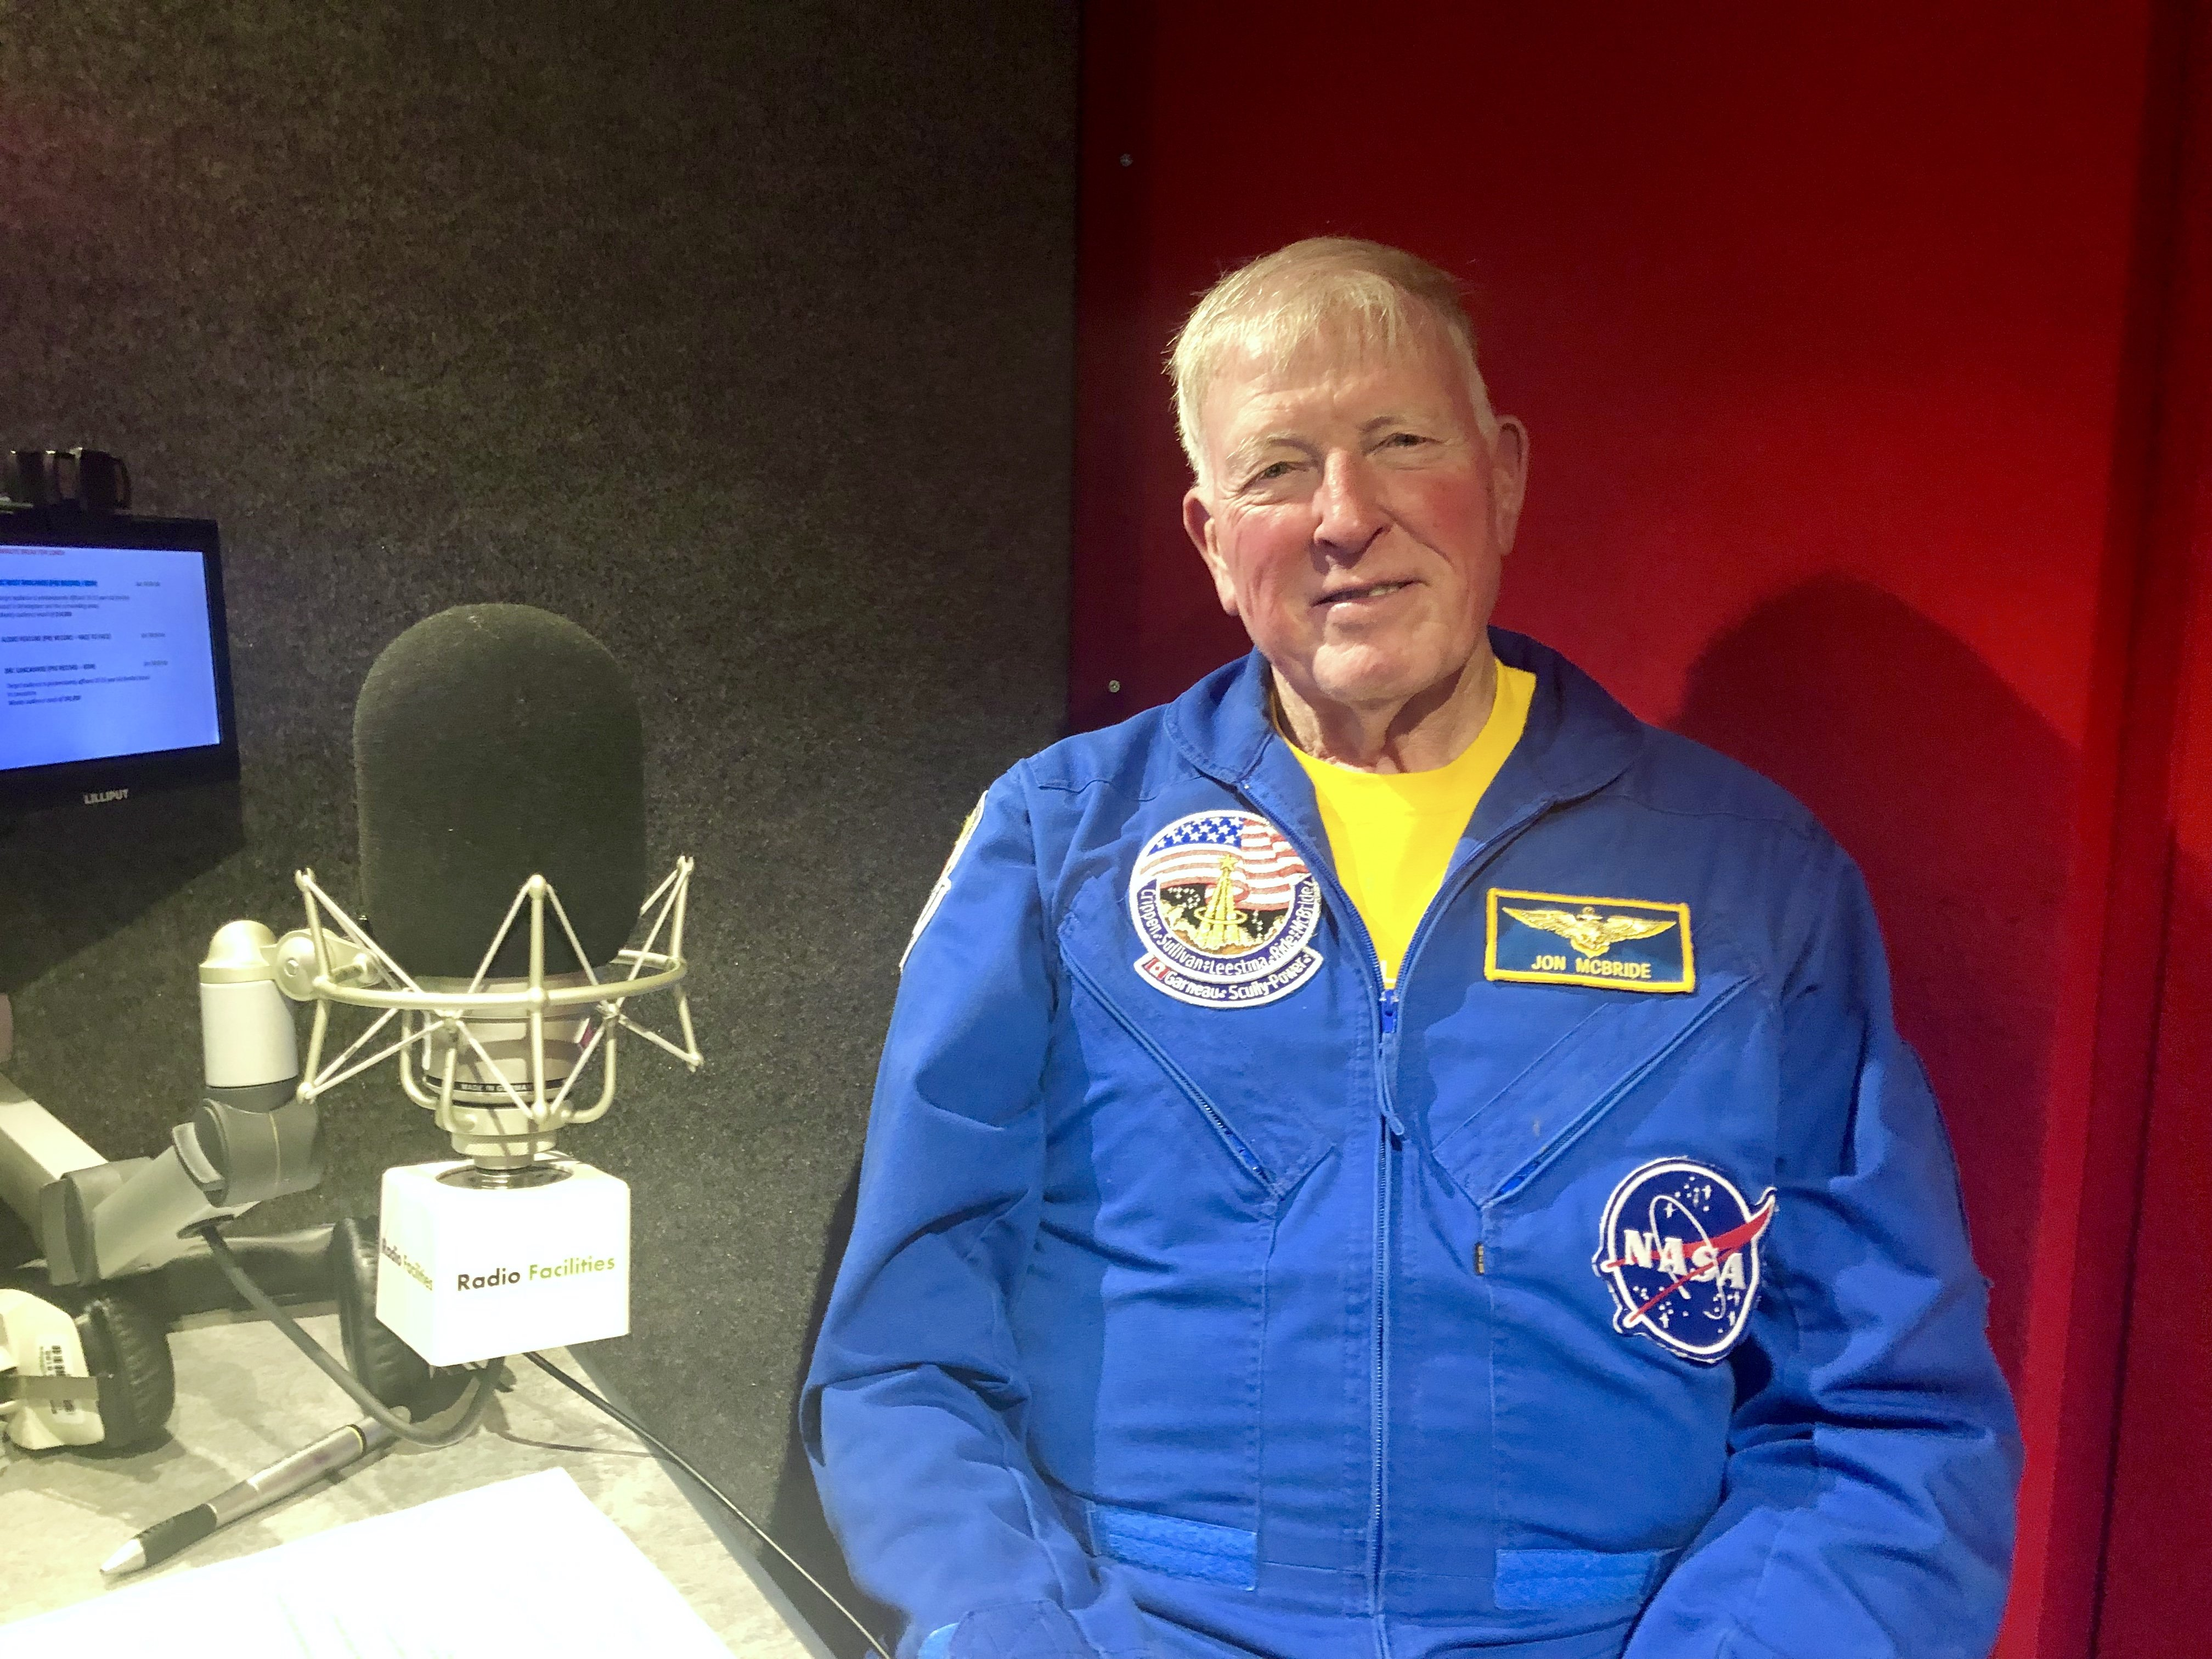 NASA Astronaut Jon McBride